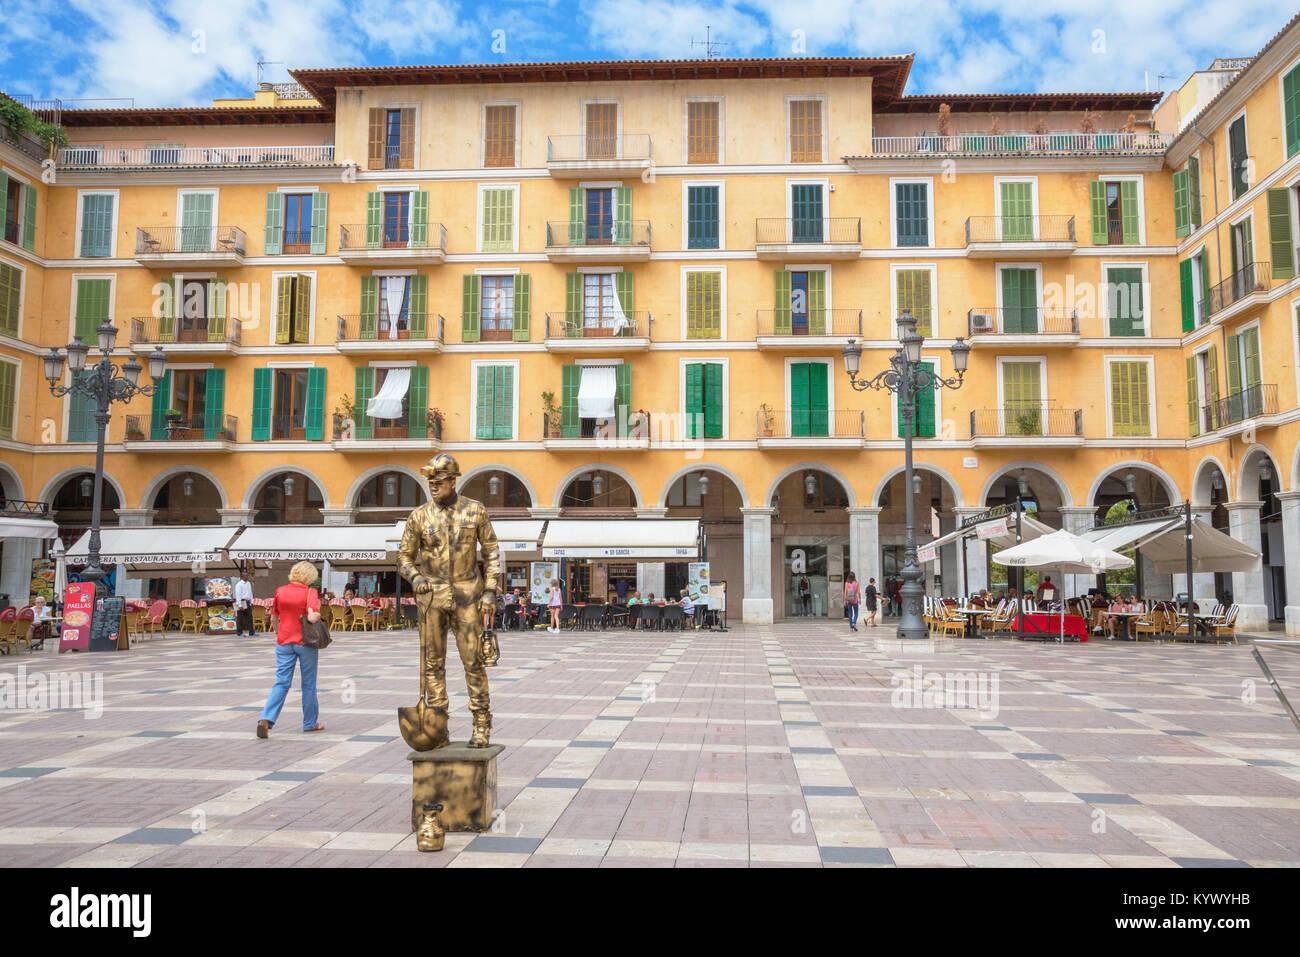 Plus grand Place, Palma de Mallorca, Majorque, Iles Baléares, Espagne, Europe Photo Stock